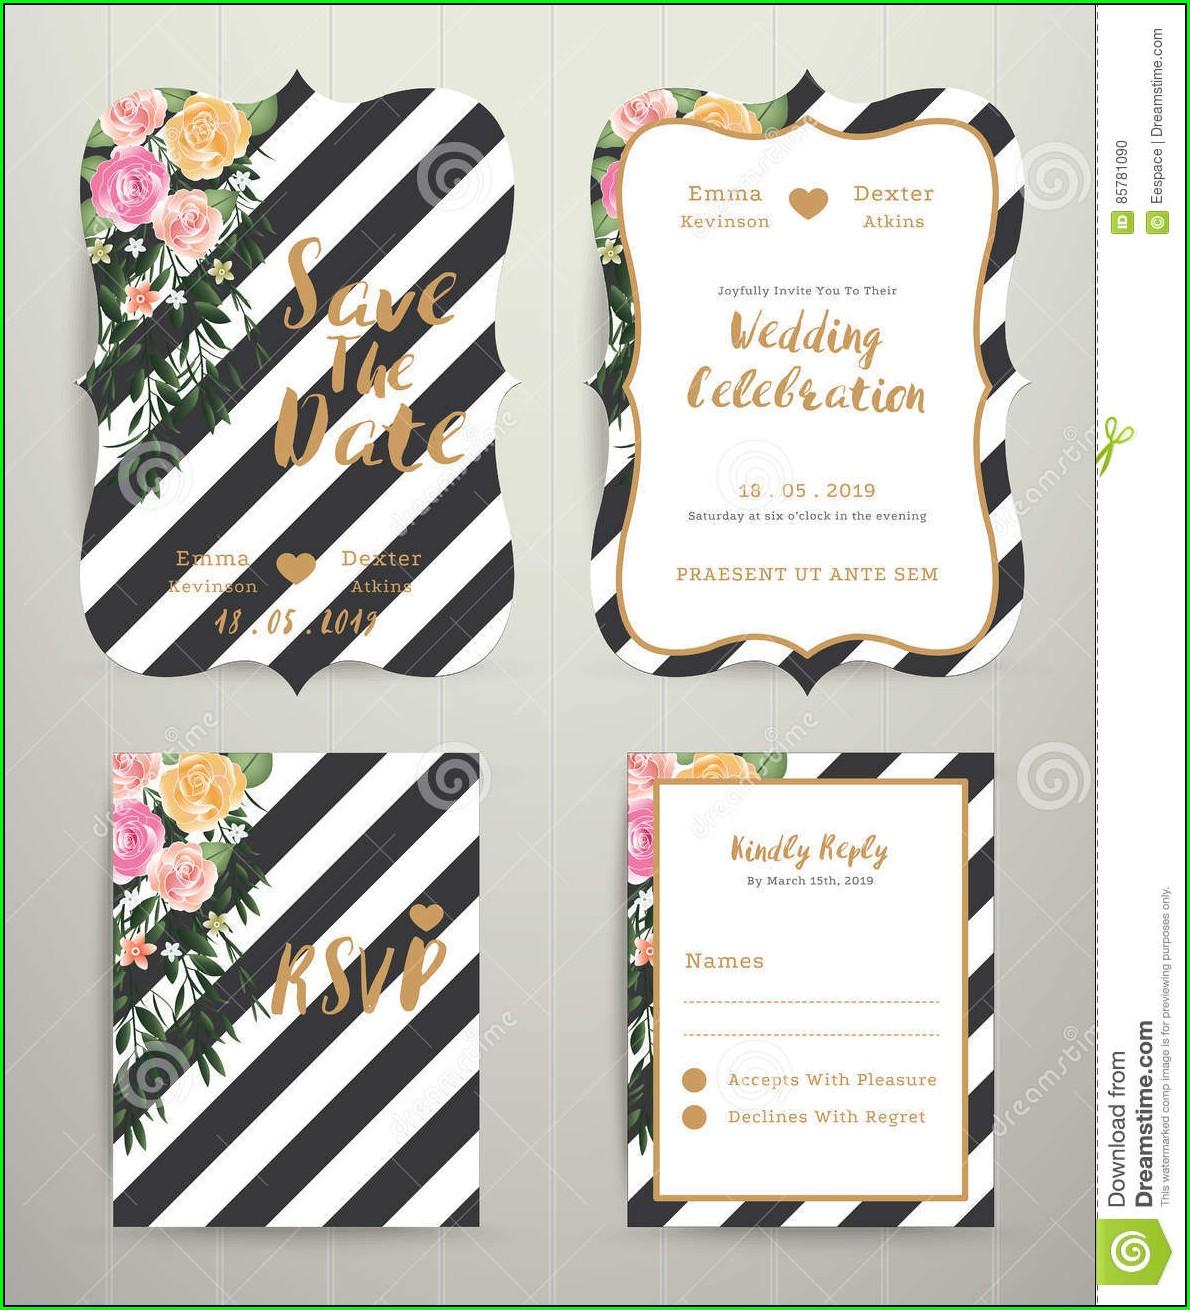 Black And White Wedding Invitation Background